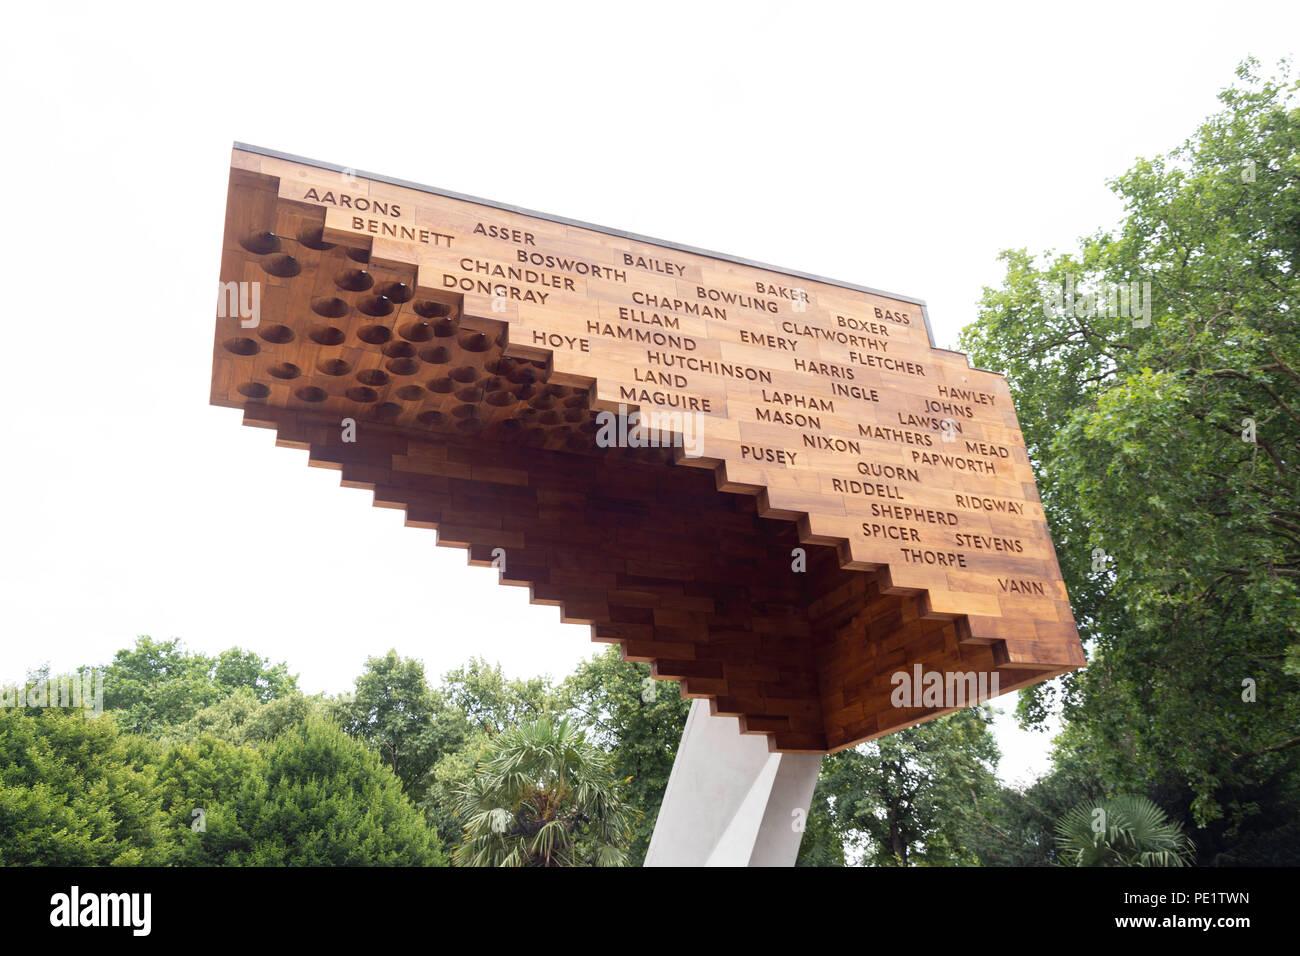 """Escalier au ciel' sculpture à Bethnal Green Gardens, Bethnal Green, le quartier londonien de Tower Hamlets, Greater London, Angleterre, Royaume-Uni Photo Stock"